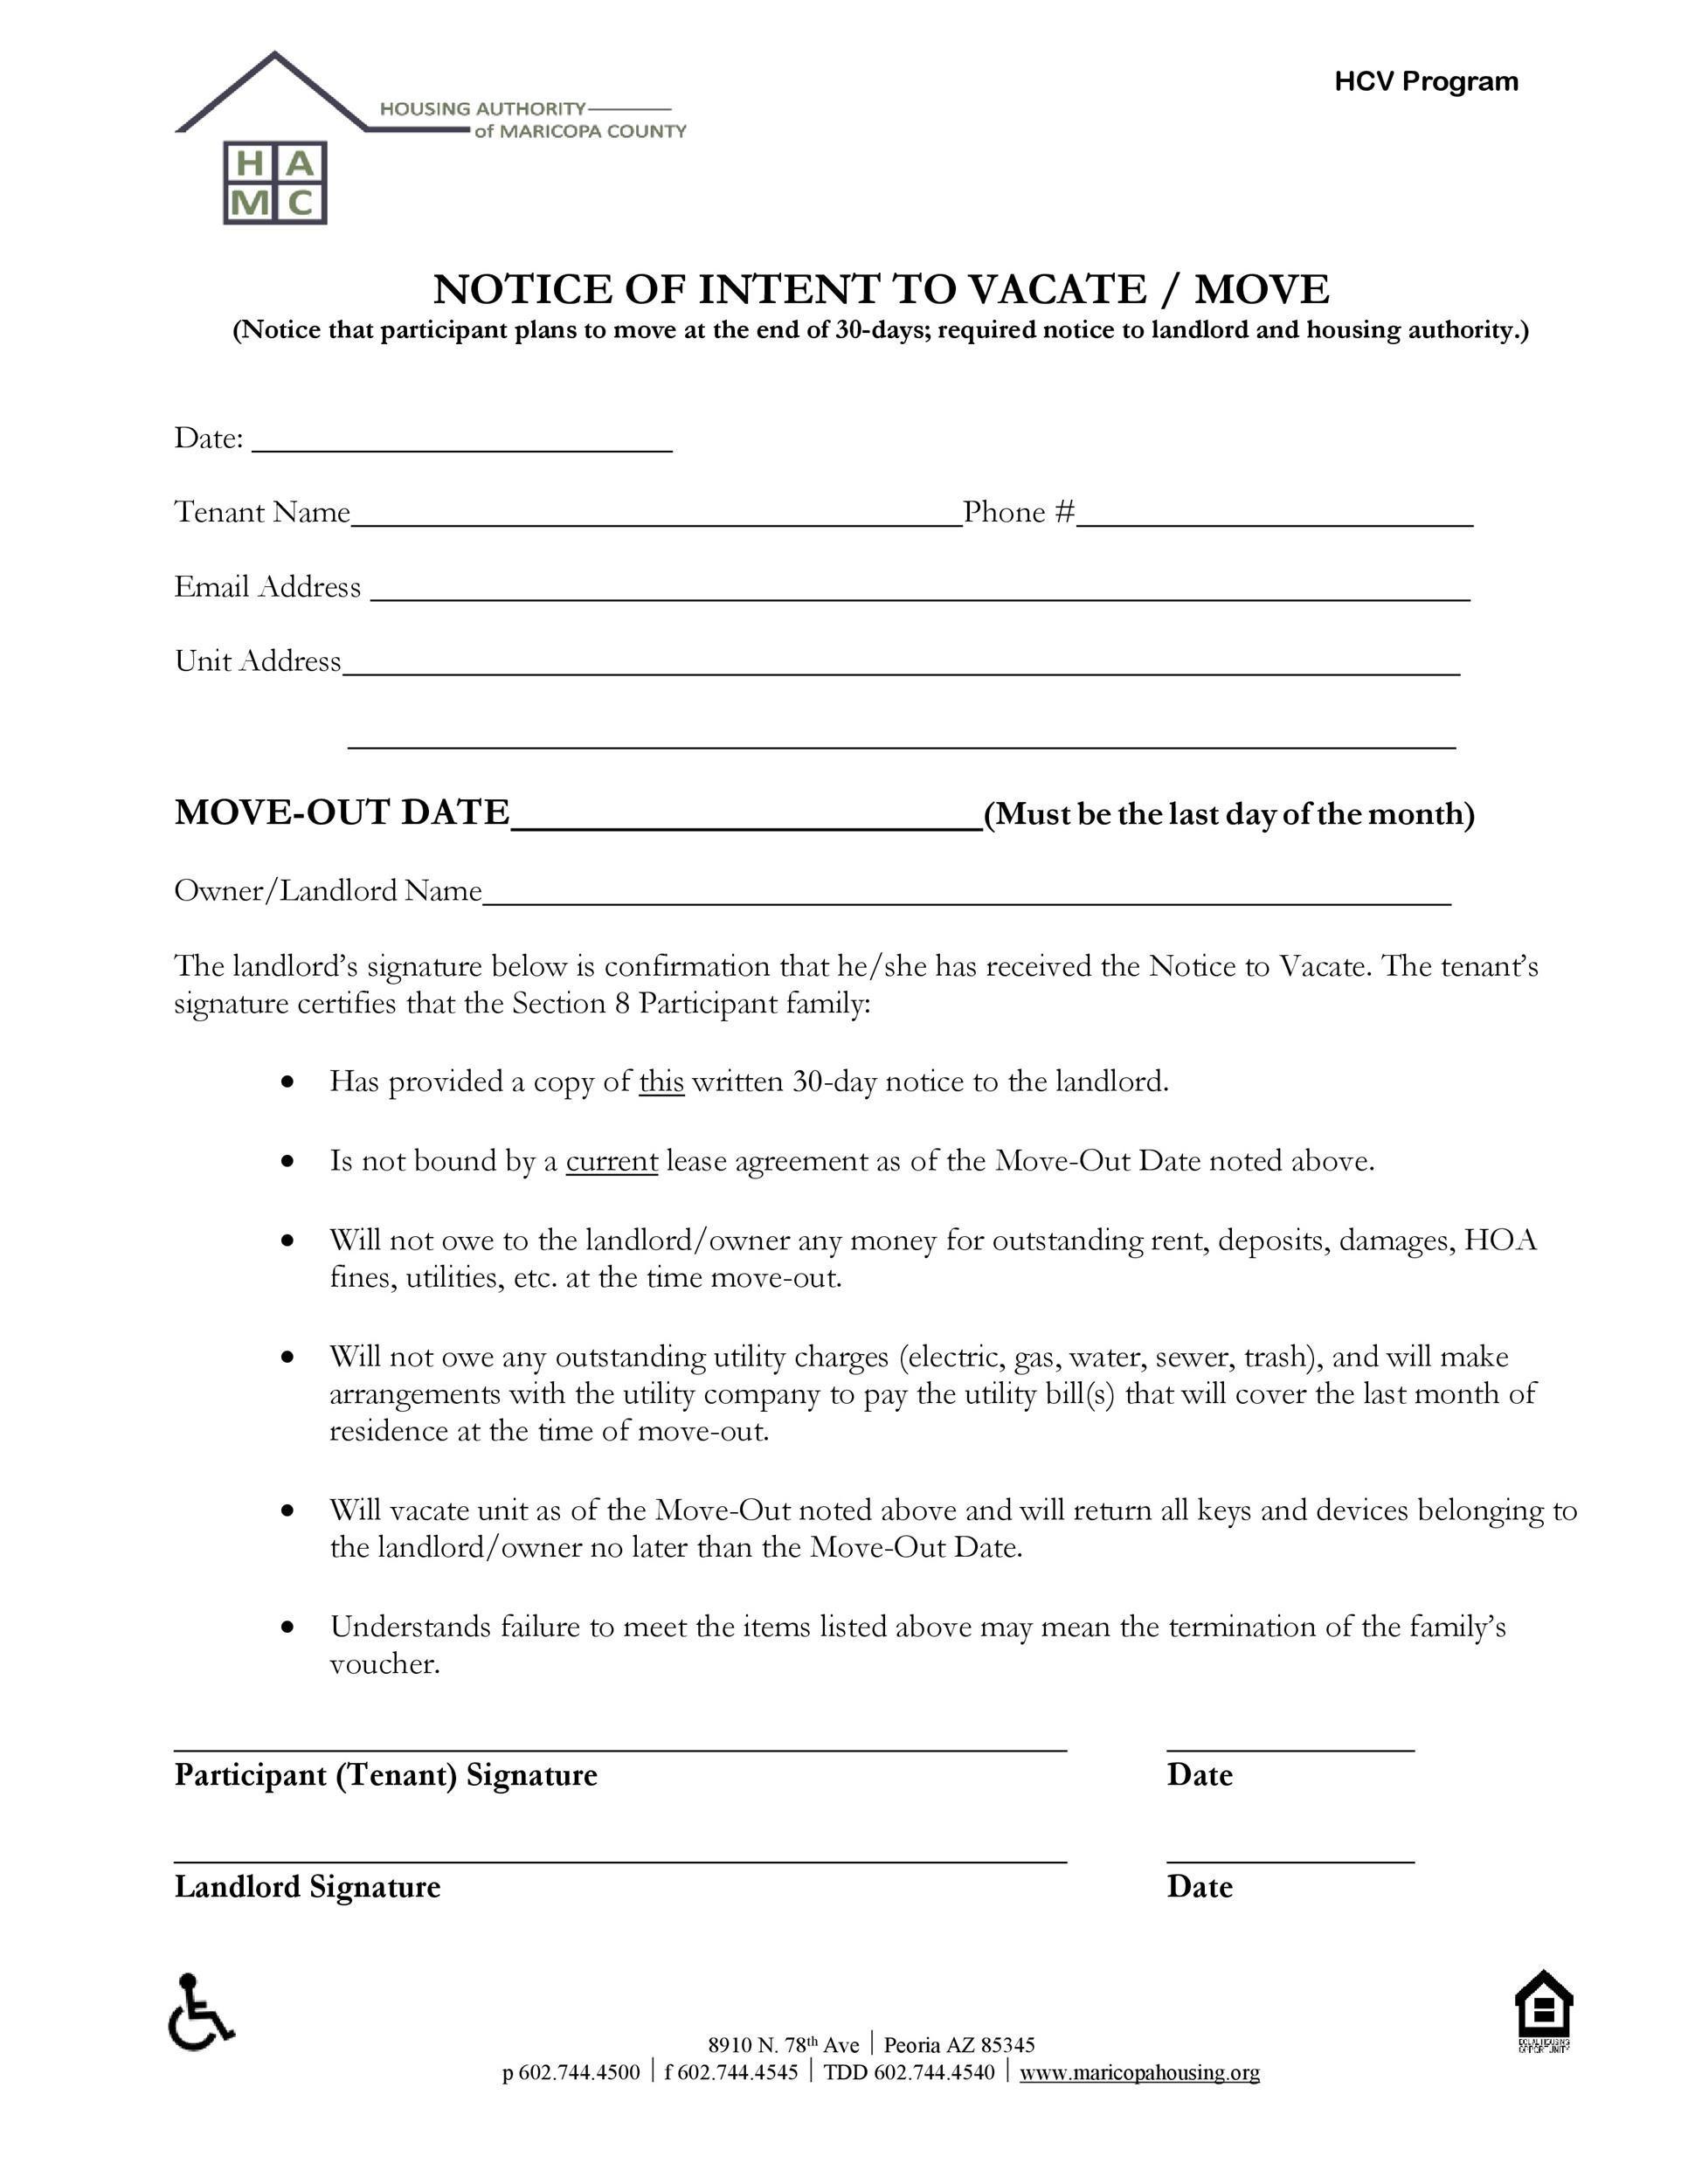 Free rescission agreement 35